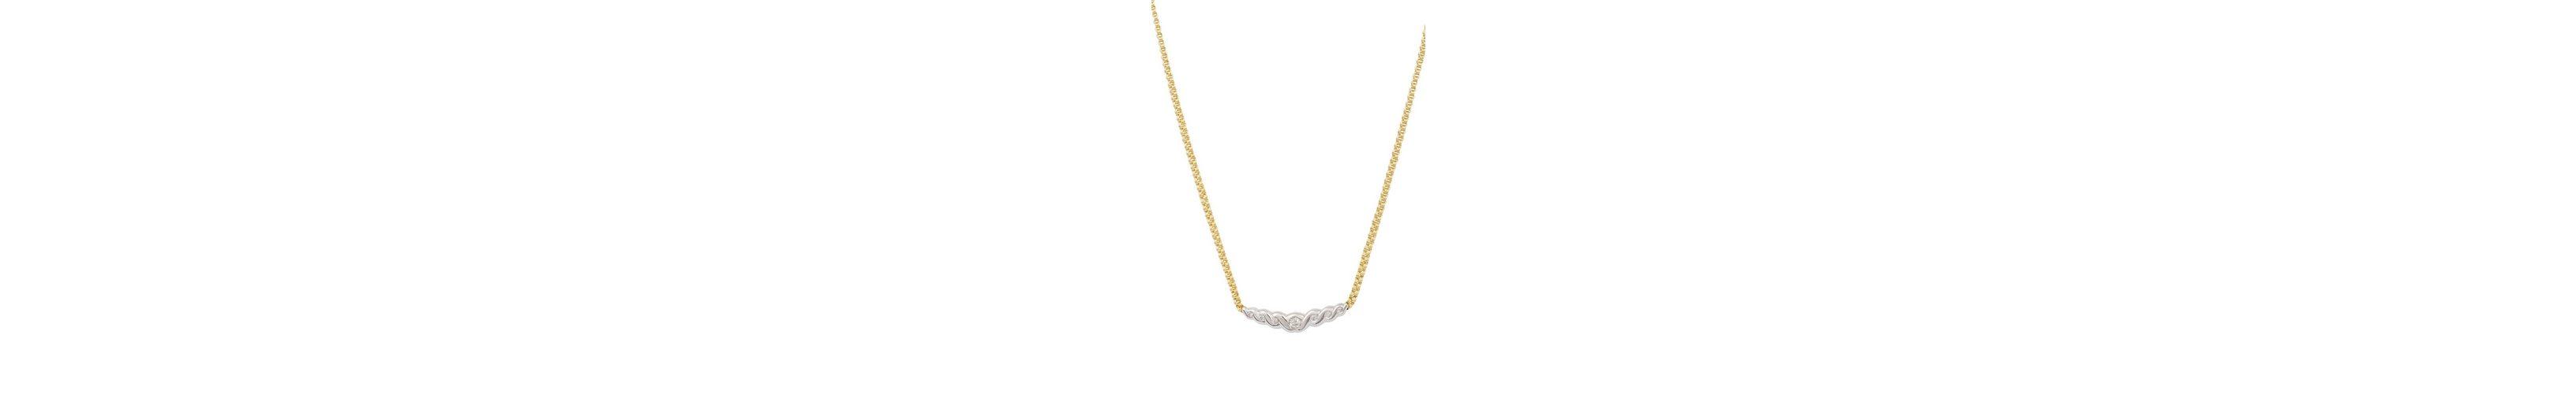 vivance jewels Kette mit Diamanten